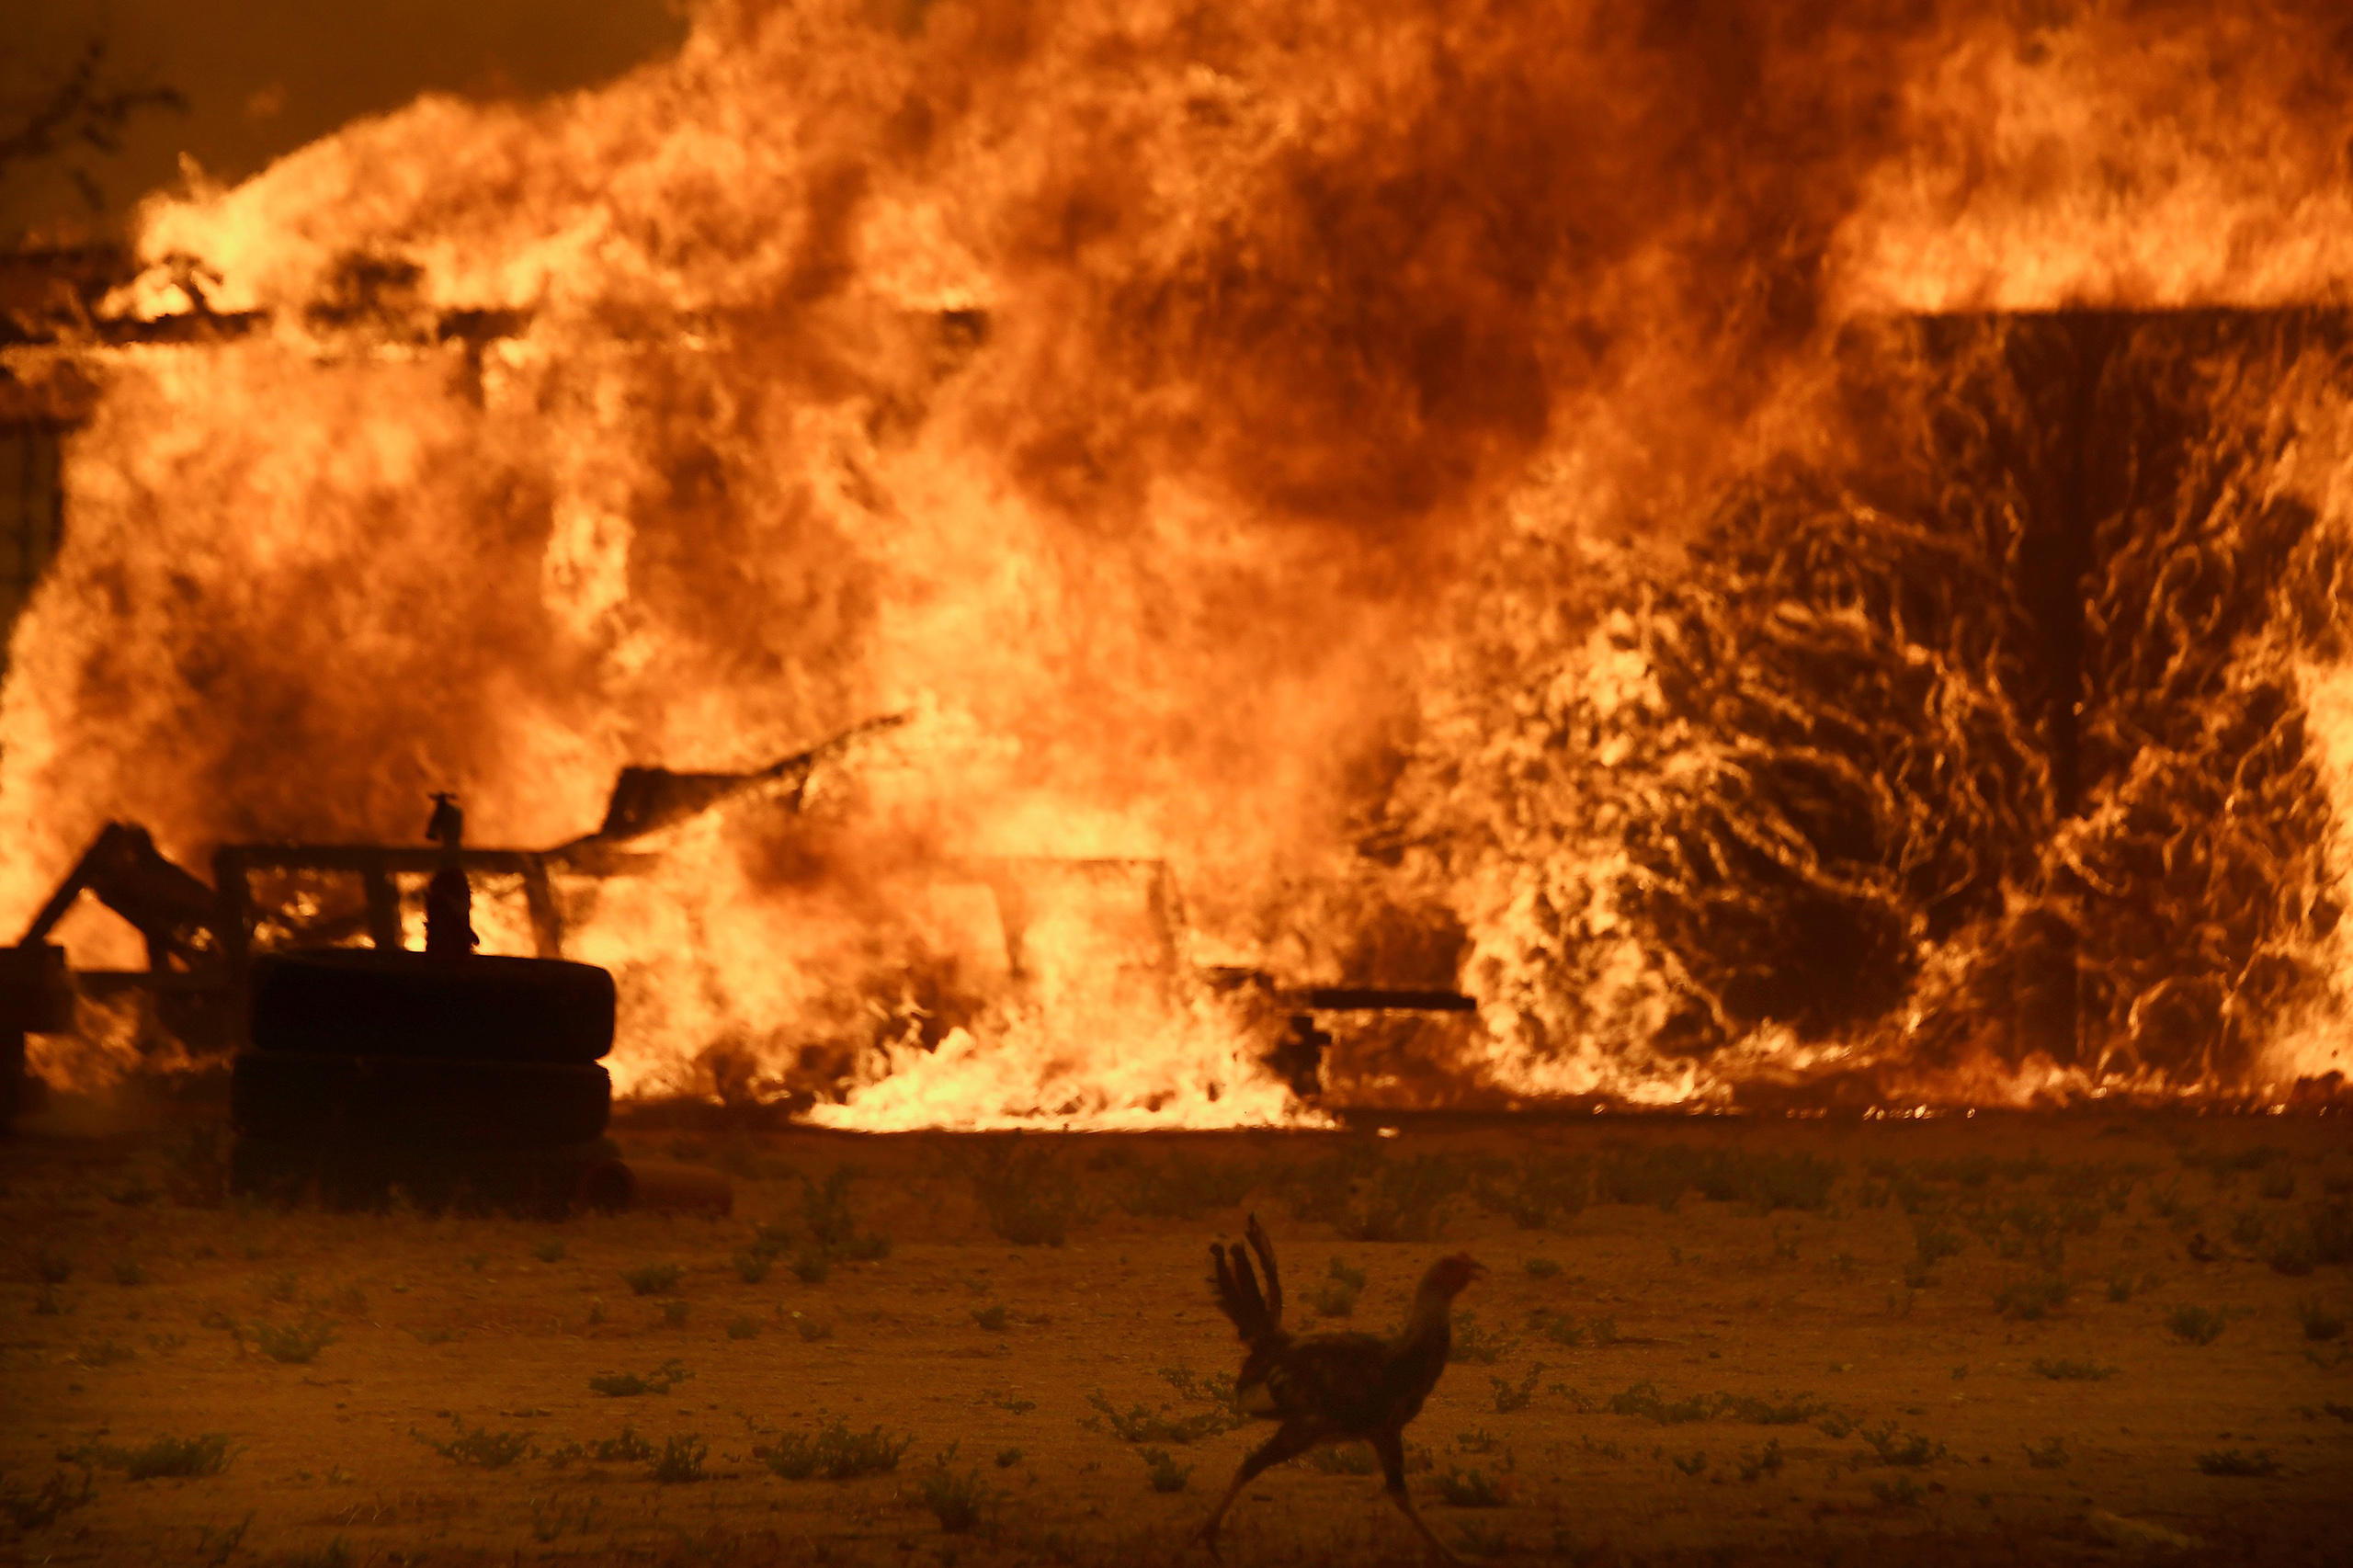 A chicken runs by a chicken coop that burns with animals still inside at in San Bernardino National Forest in San Bernardino County, Calif., Aug. 16, 2016.